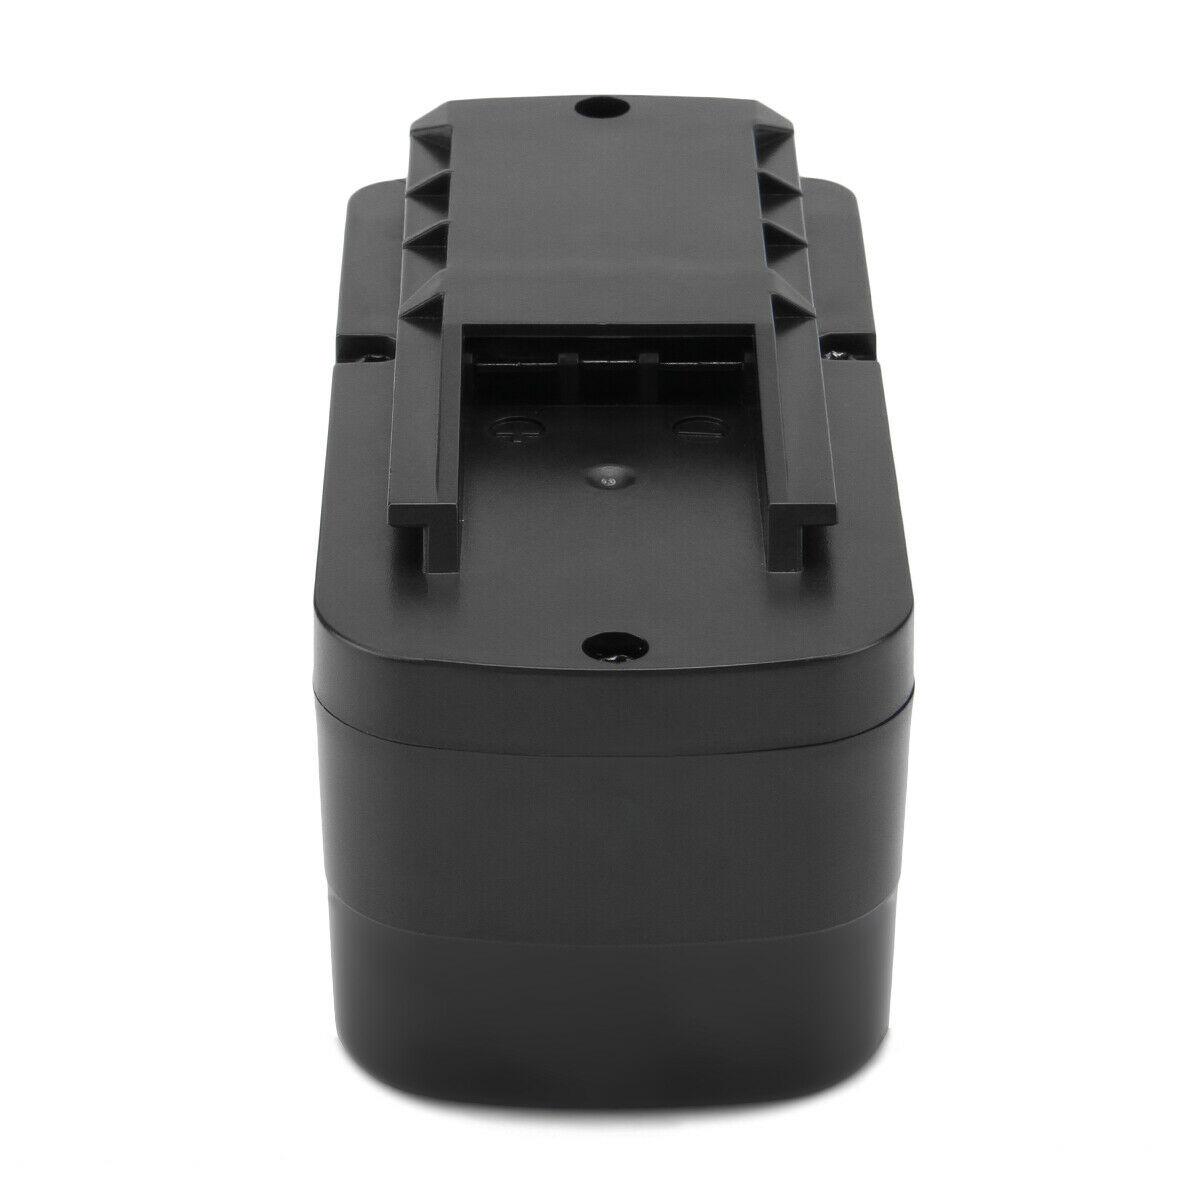 BPS 12 C BPS 12 S Festool C 12 , C 12 DUO, C 12 LI 12V compatibele Accu